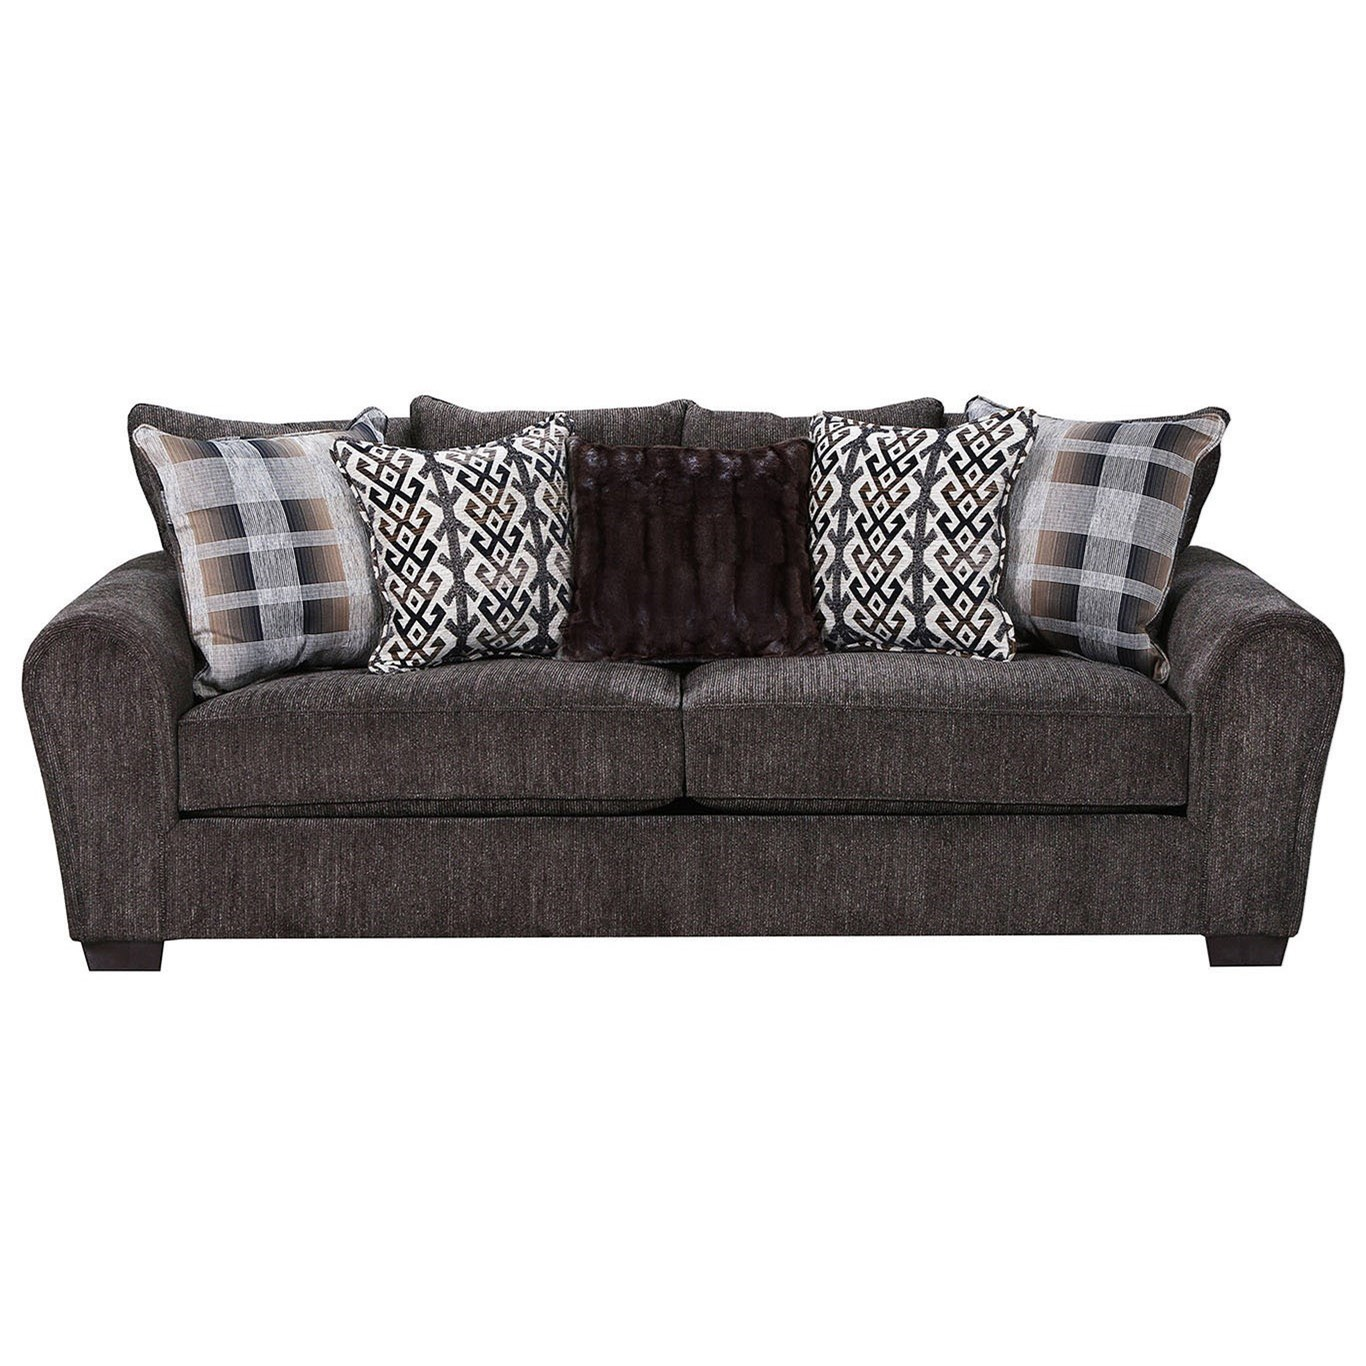 9182BR Sofa by United Furniture Industries at Bullard Furniture